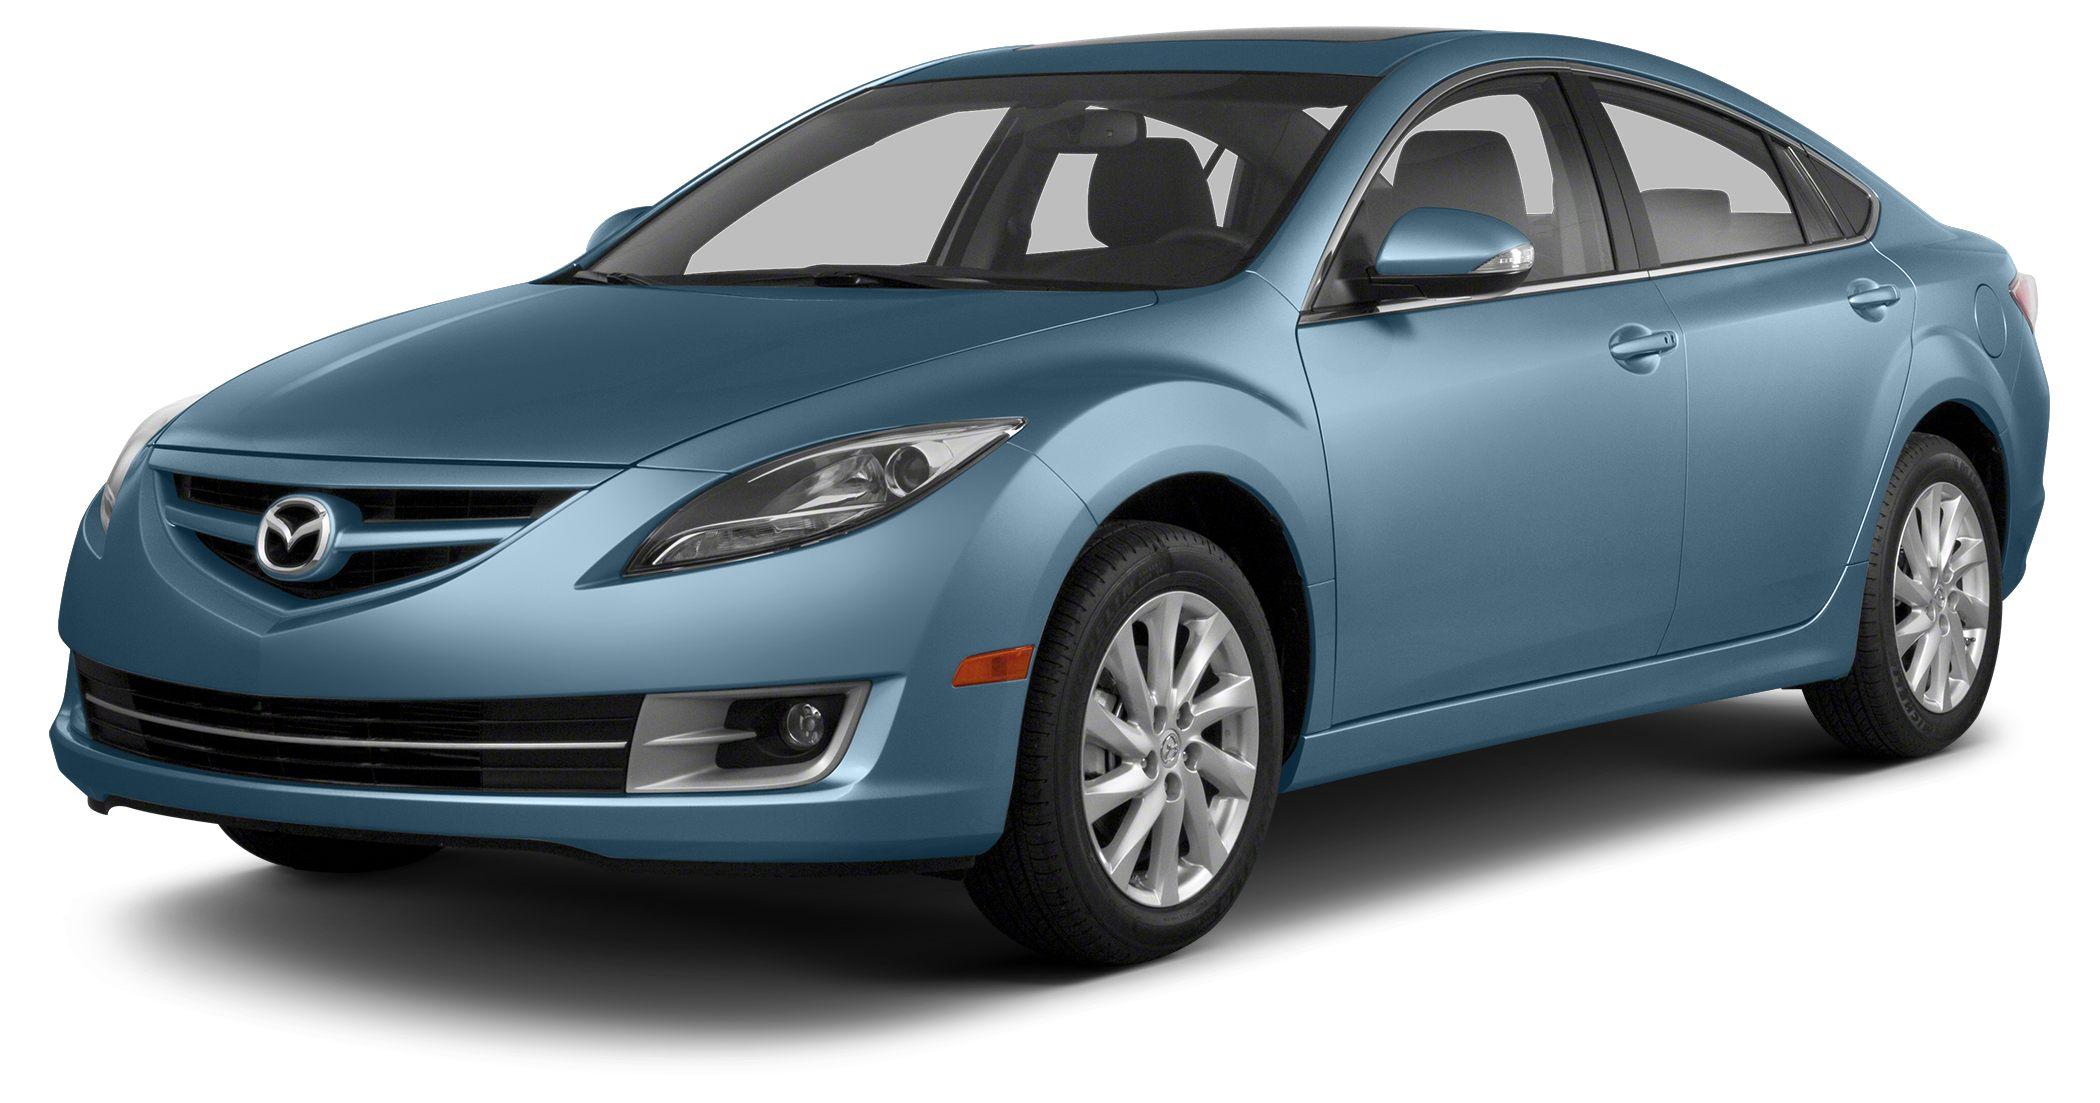 2013 Mazda MAZDA6 i Sport Miles 54874Color Steel Blue Mica Stock 165124A VIN 1YVHZ8BH3D5M147